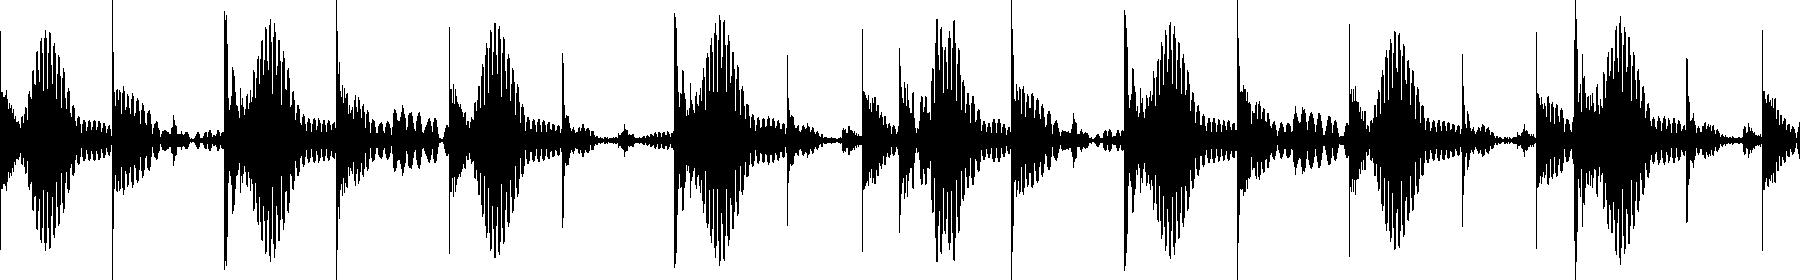 52784 140 gamma wav